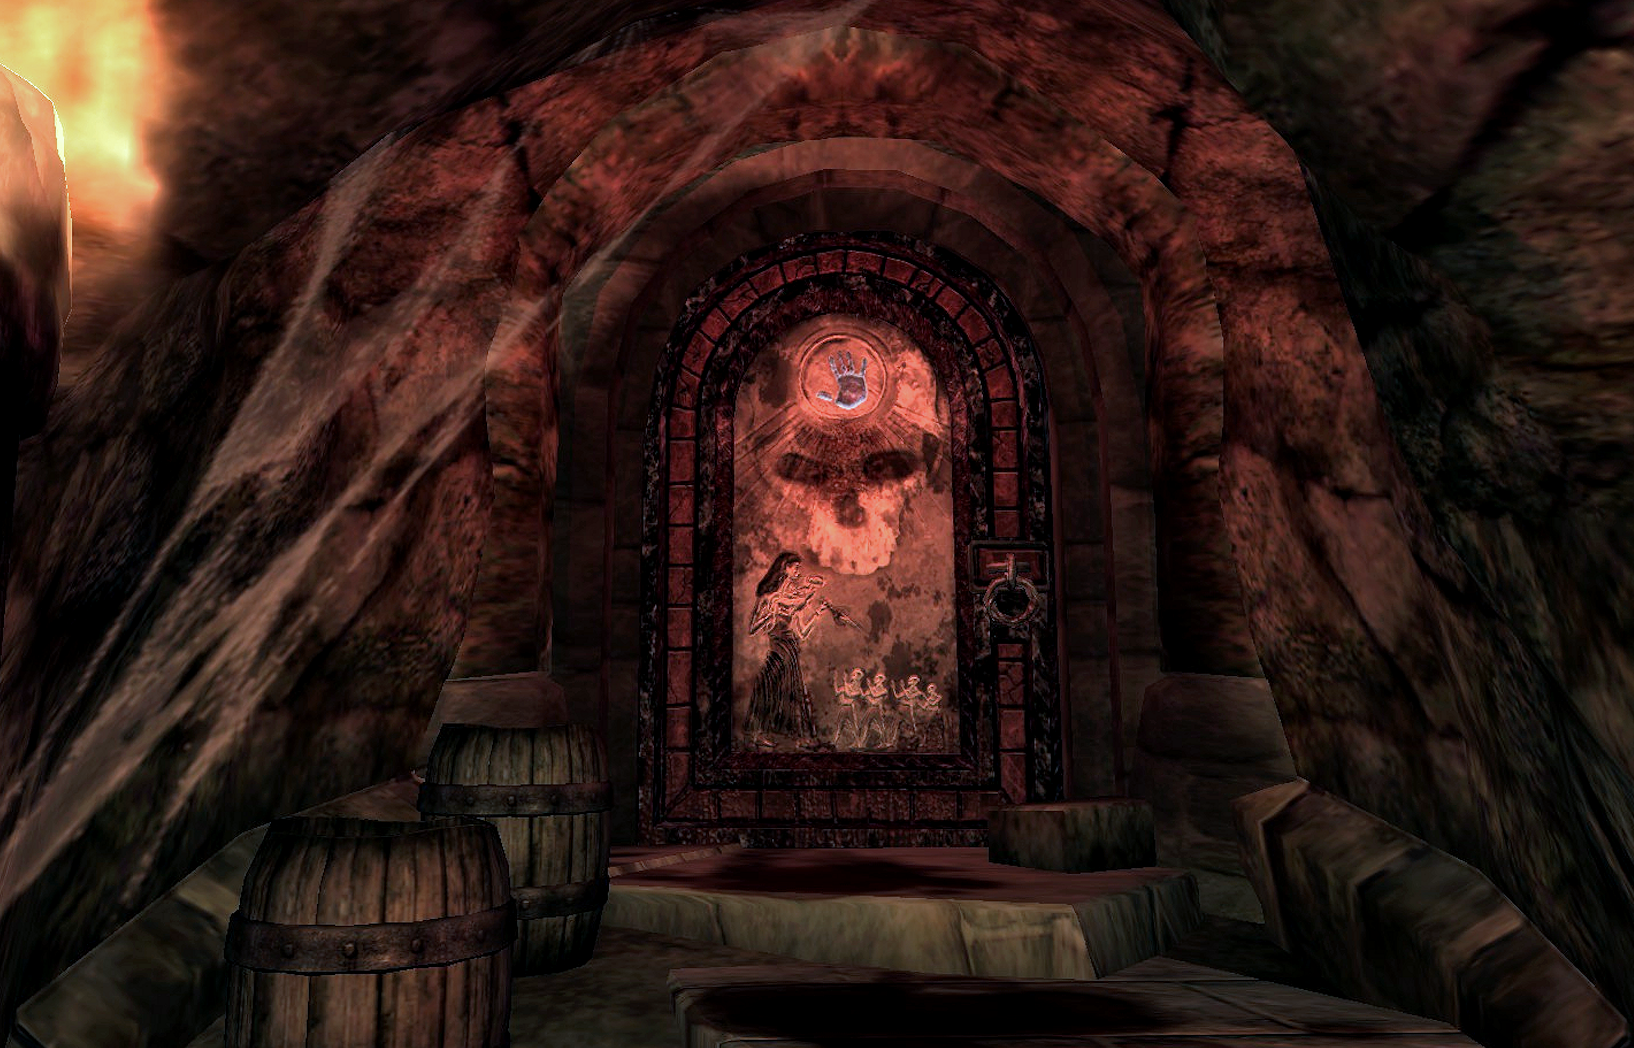 http://images.wikia.com/elderscrolls/images/c/c8/Dark_Brotherhood_Sanctuary_(Oblivion).png